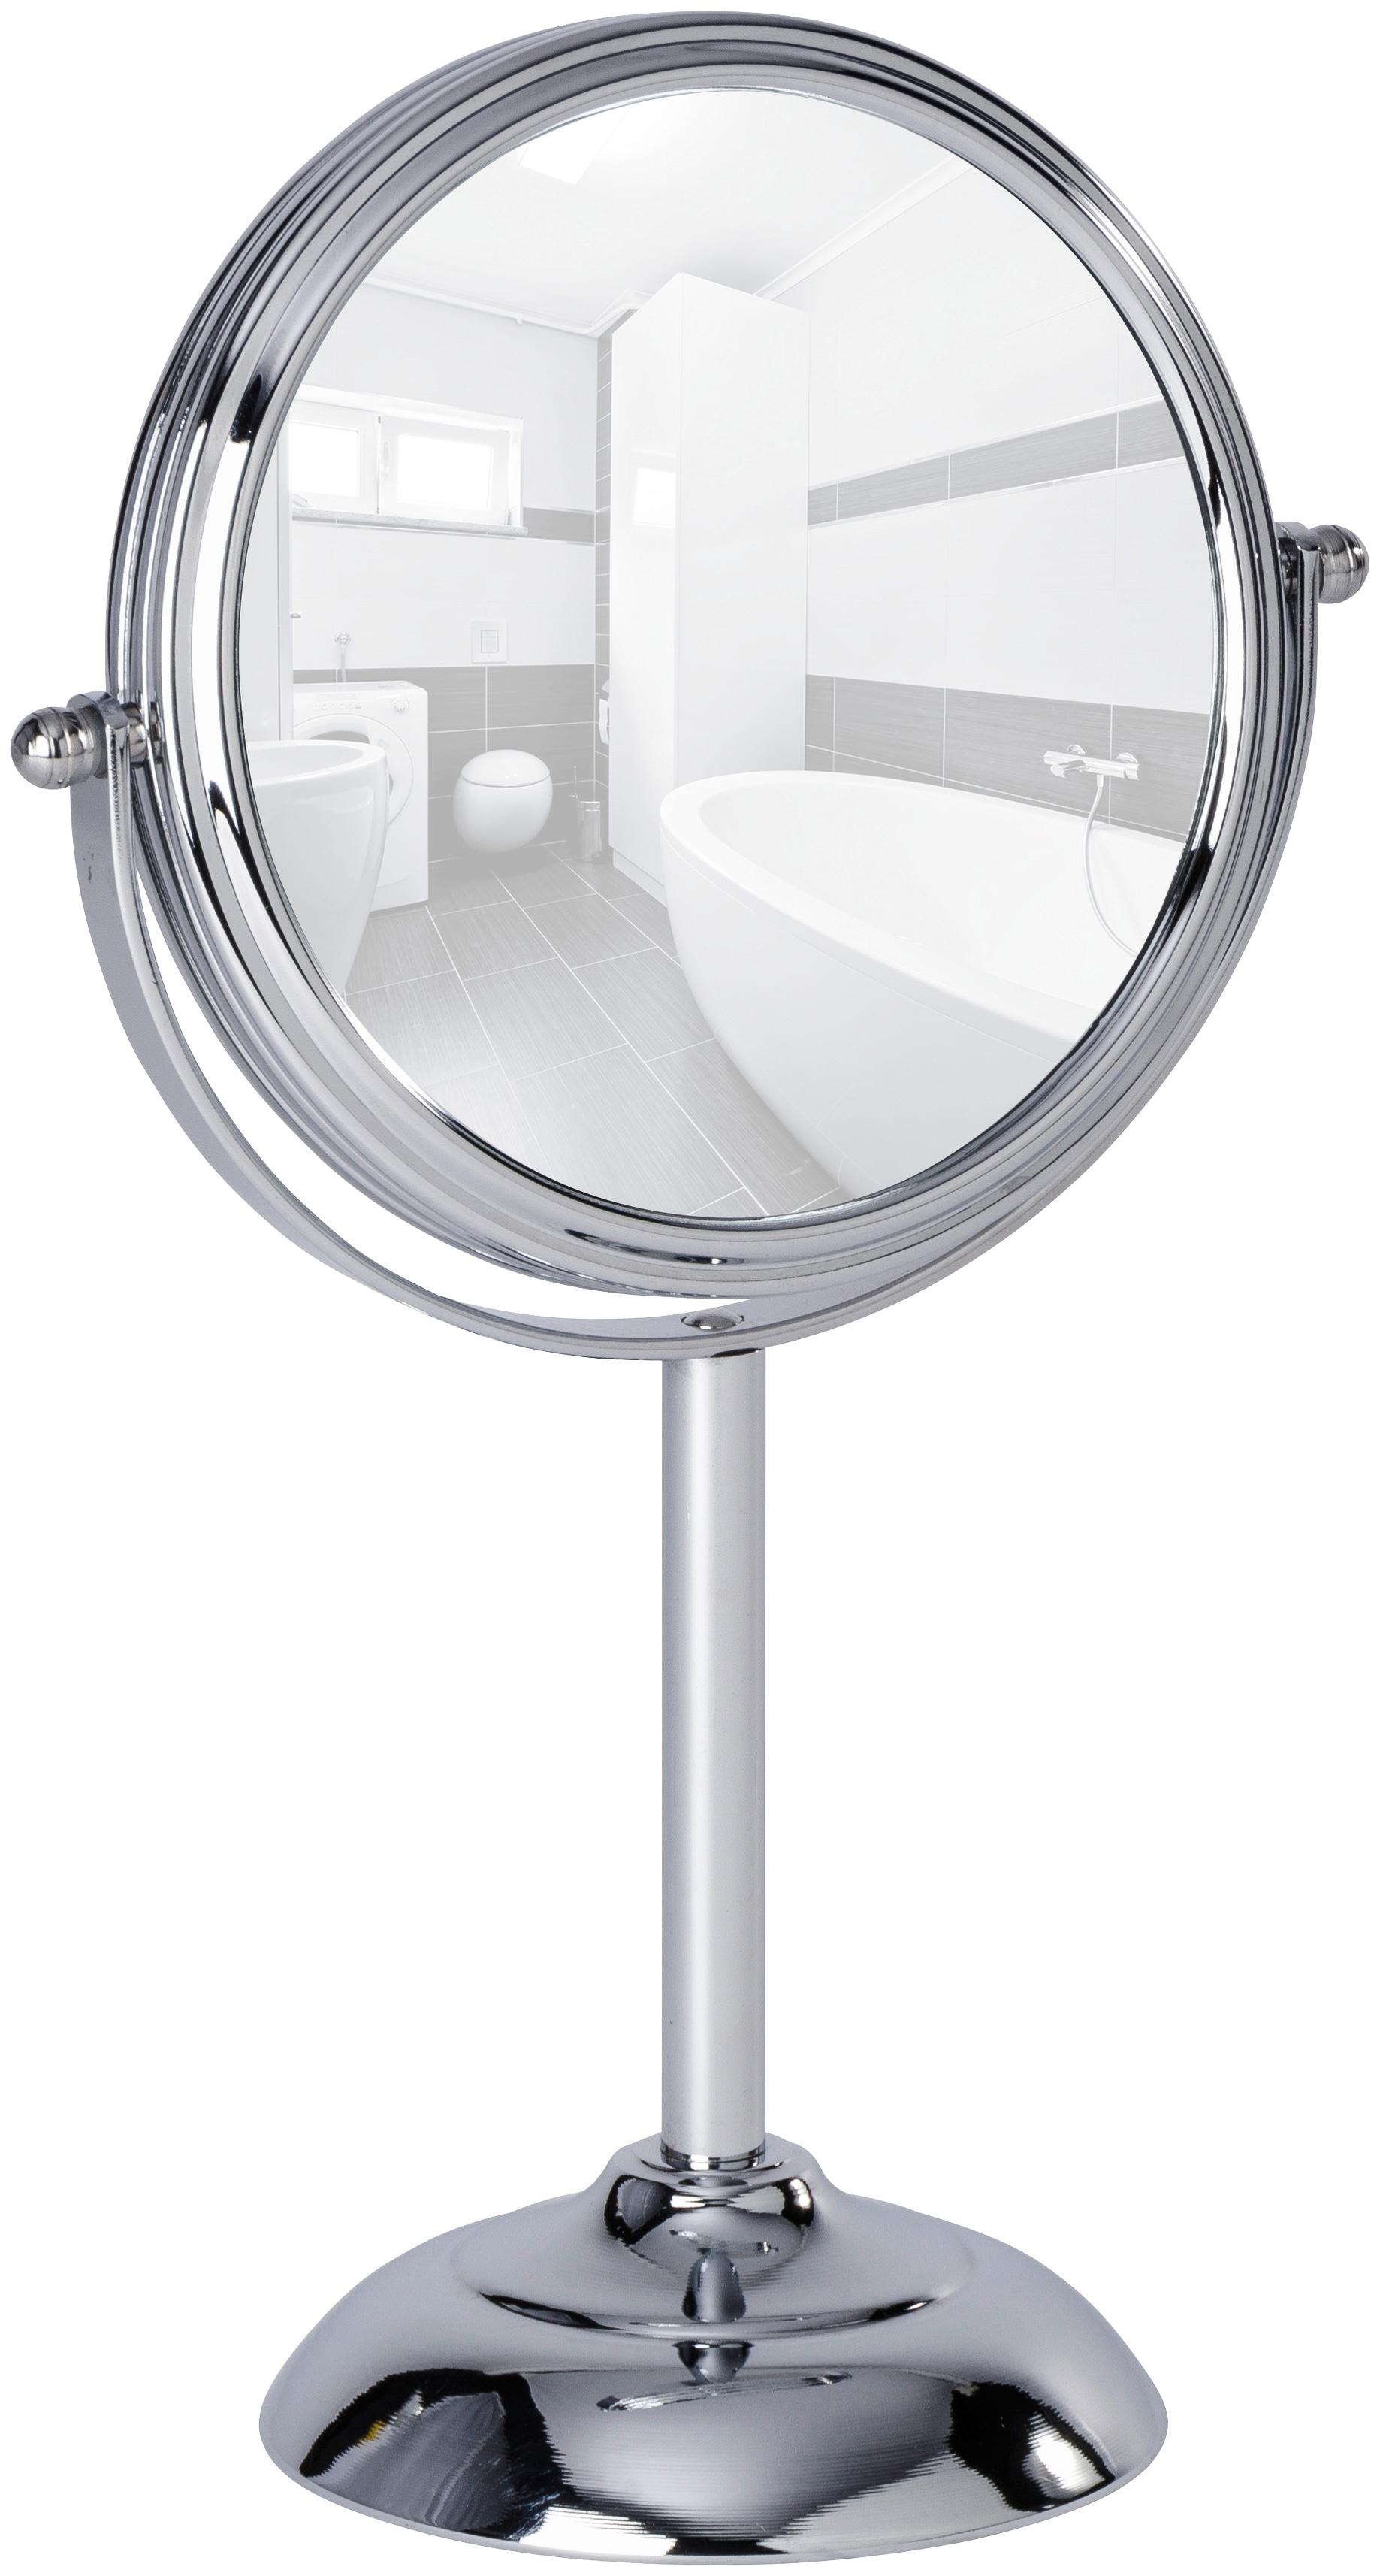 Wenko Kosmetikspiegel »Globo« | Bad > Bad-Accessoires > Kosmetikspiegel | Stahl | Wenko